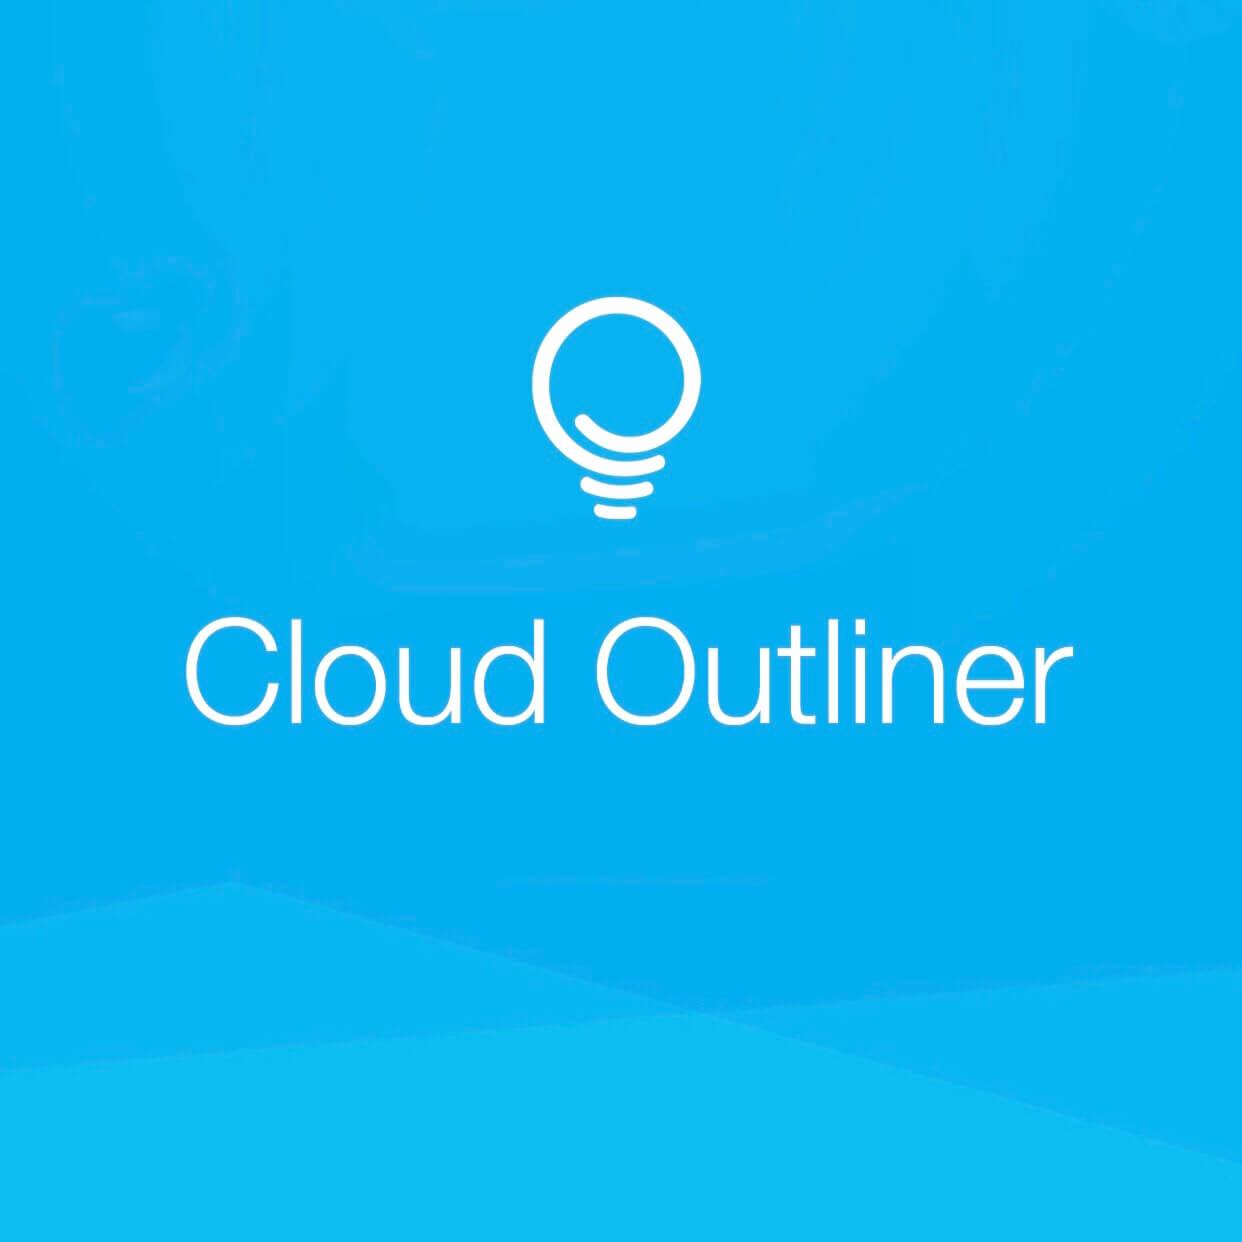 Cloud Outliner Proでプレーンなテキストを書き出す方法